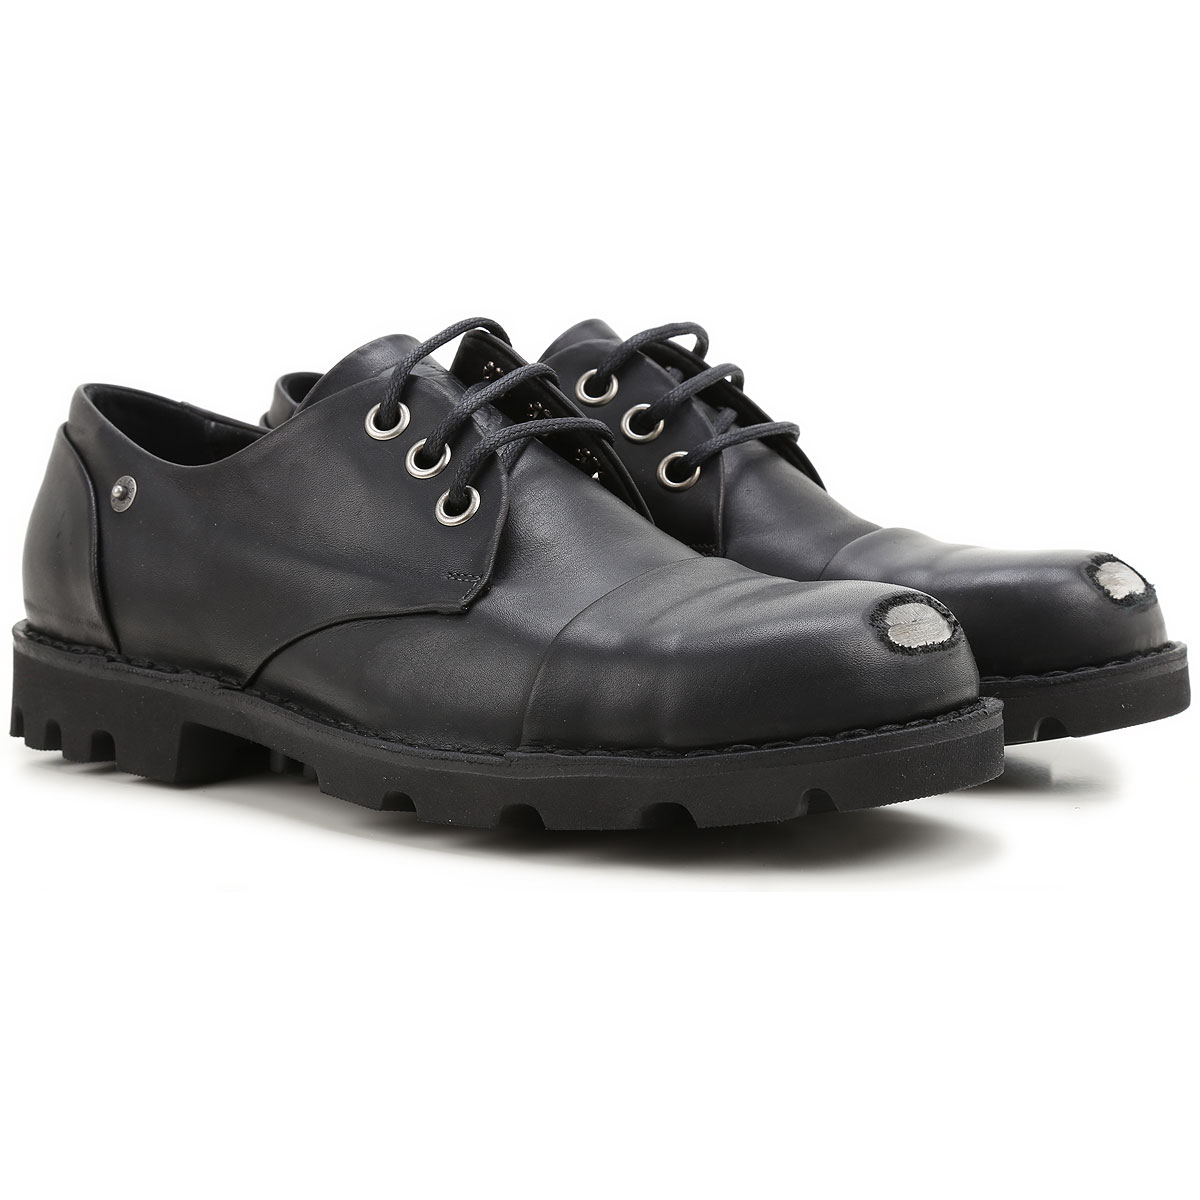 chaussures homme diesel code produit y01355 p1028 t8013. Black Bedroom Furniture Sets. Home Design Ideas